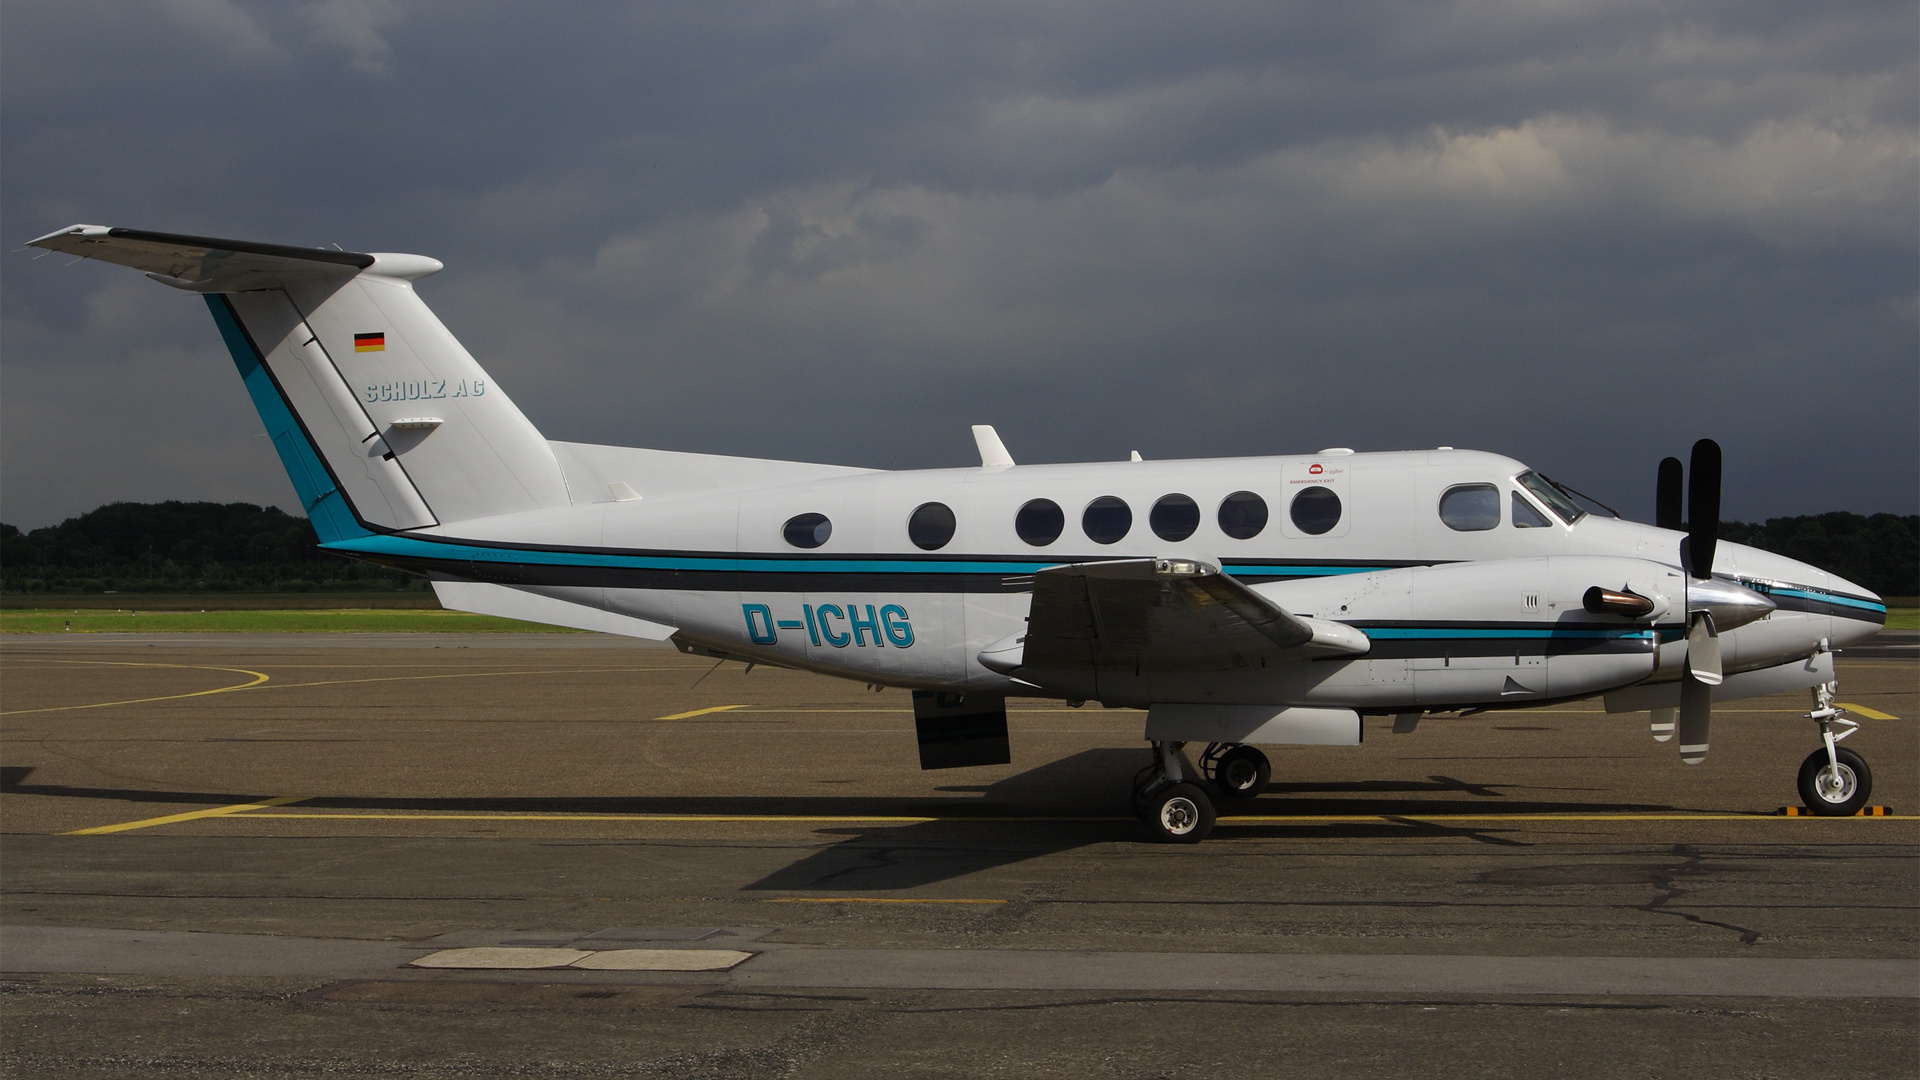 D-ICHG-1 B200 ESS 200806